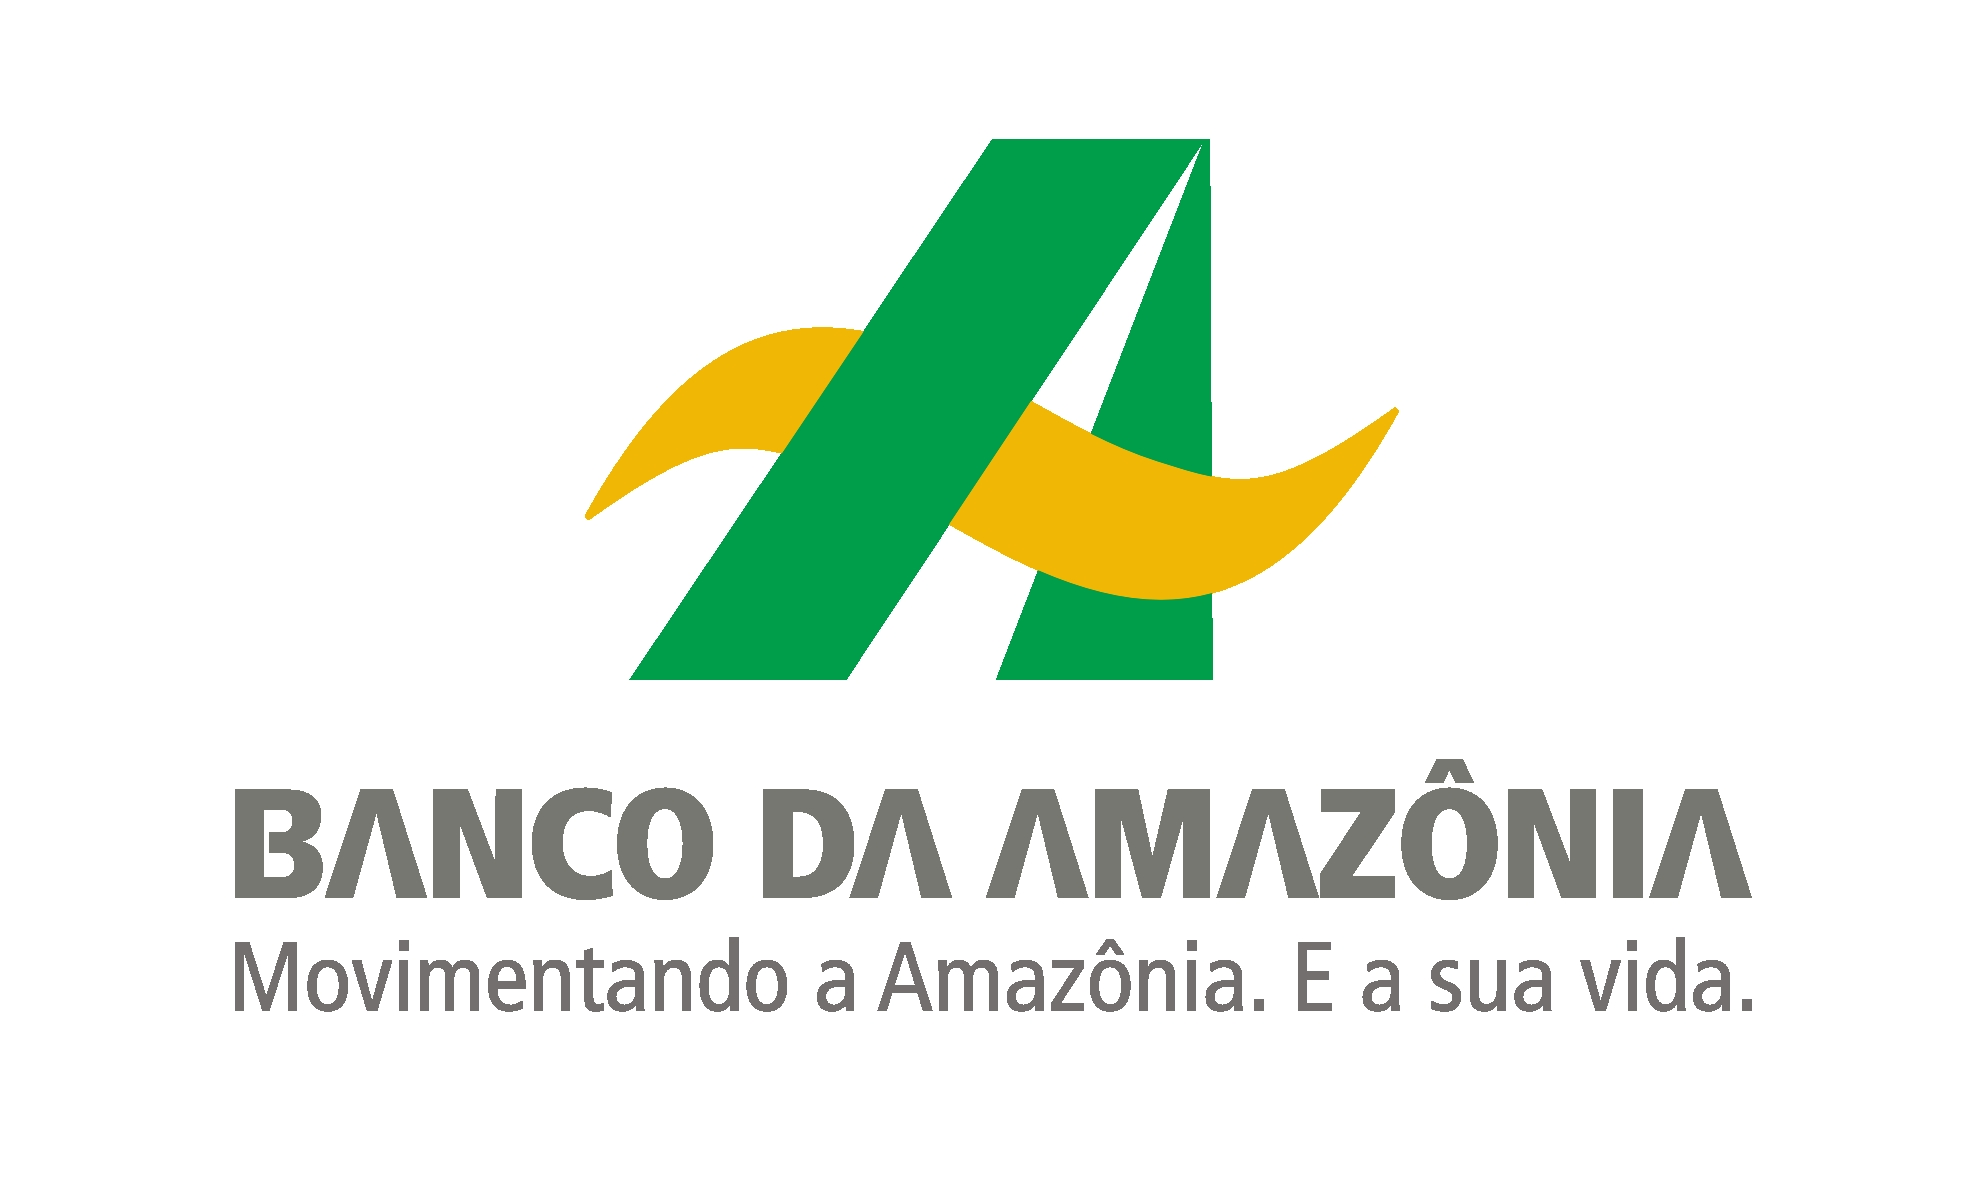 banco-da-amazc3b4nia-divulga-edital-para-nc3advel-superior